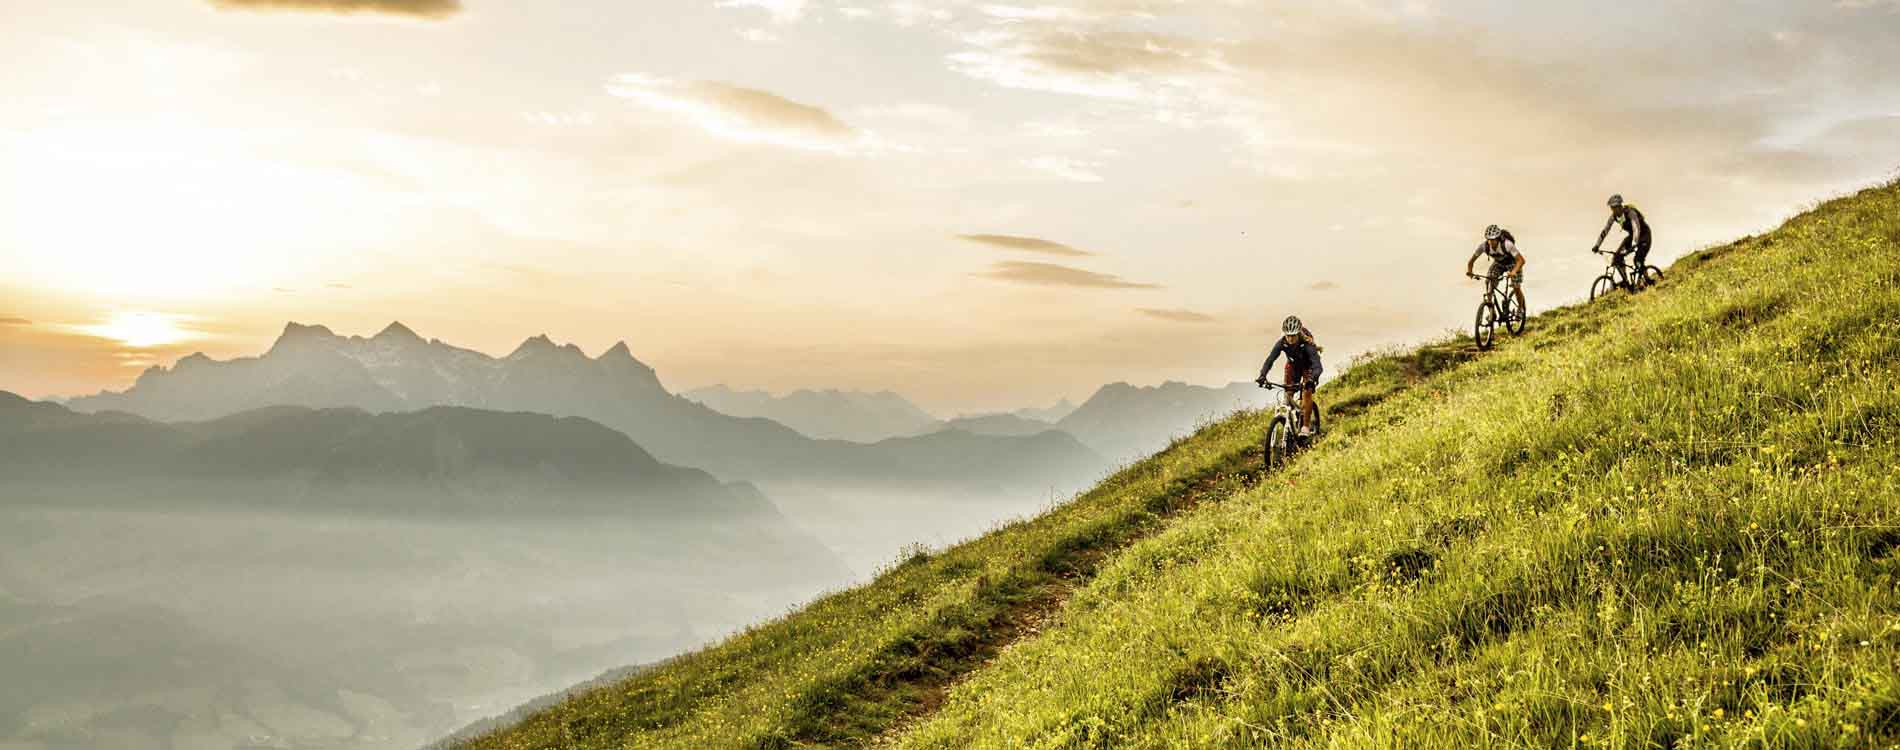 Biking package 7 nights Austria Kirchberg Tyrol Rosengarten Summer Sports